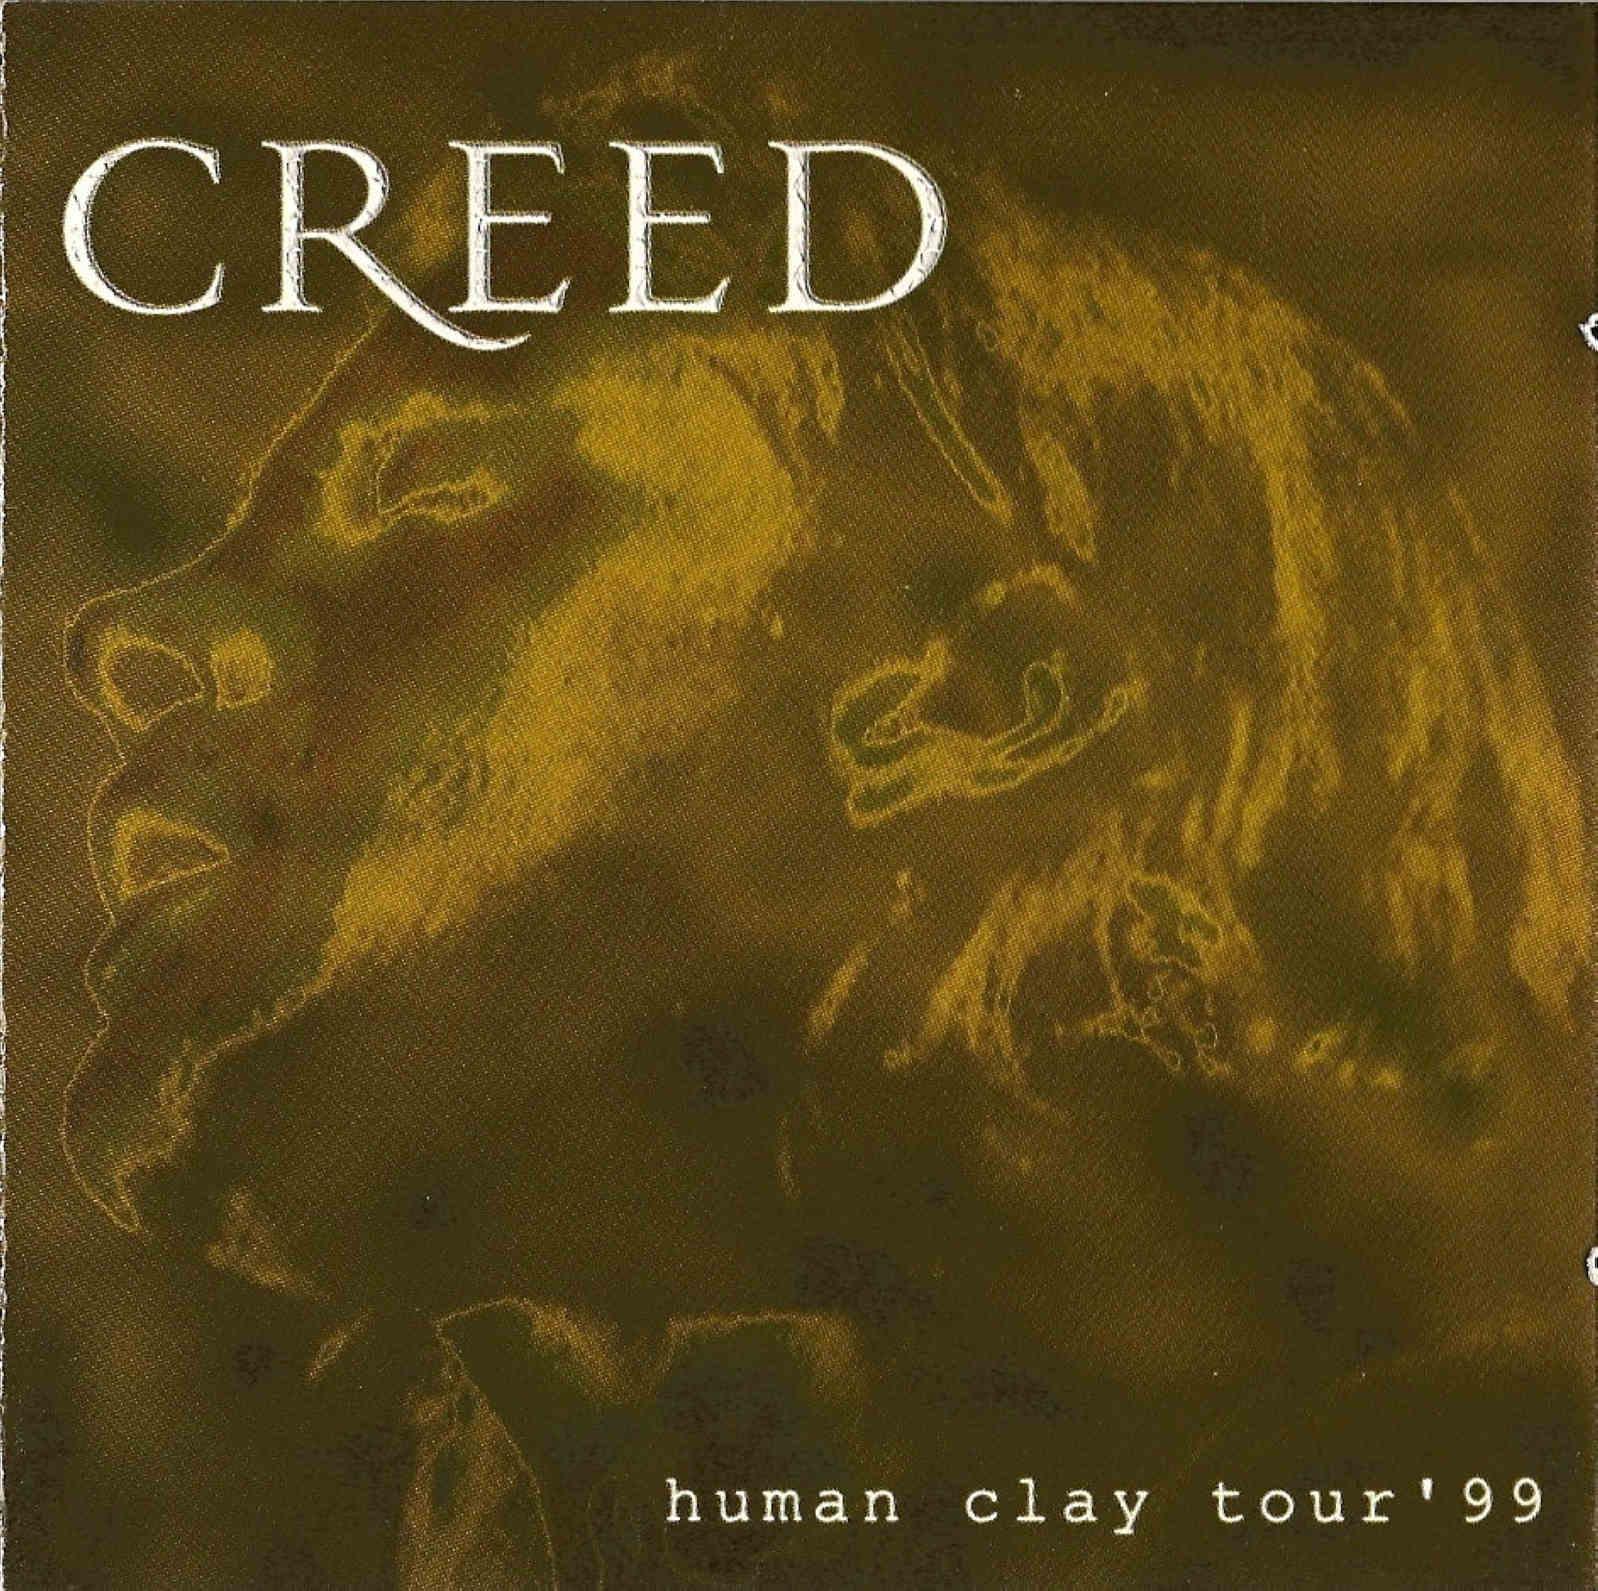 Creed: Human Clay Tour '99  Freeman Coliseum, San Antonio